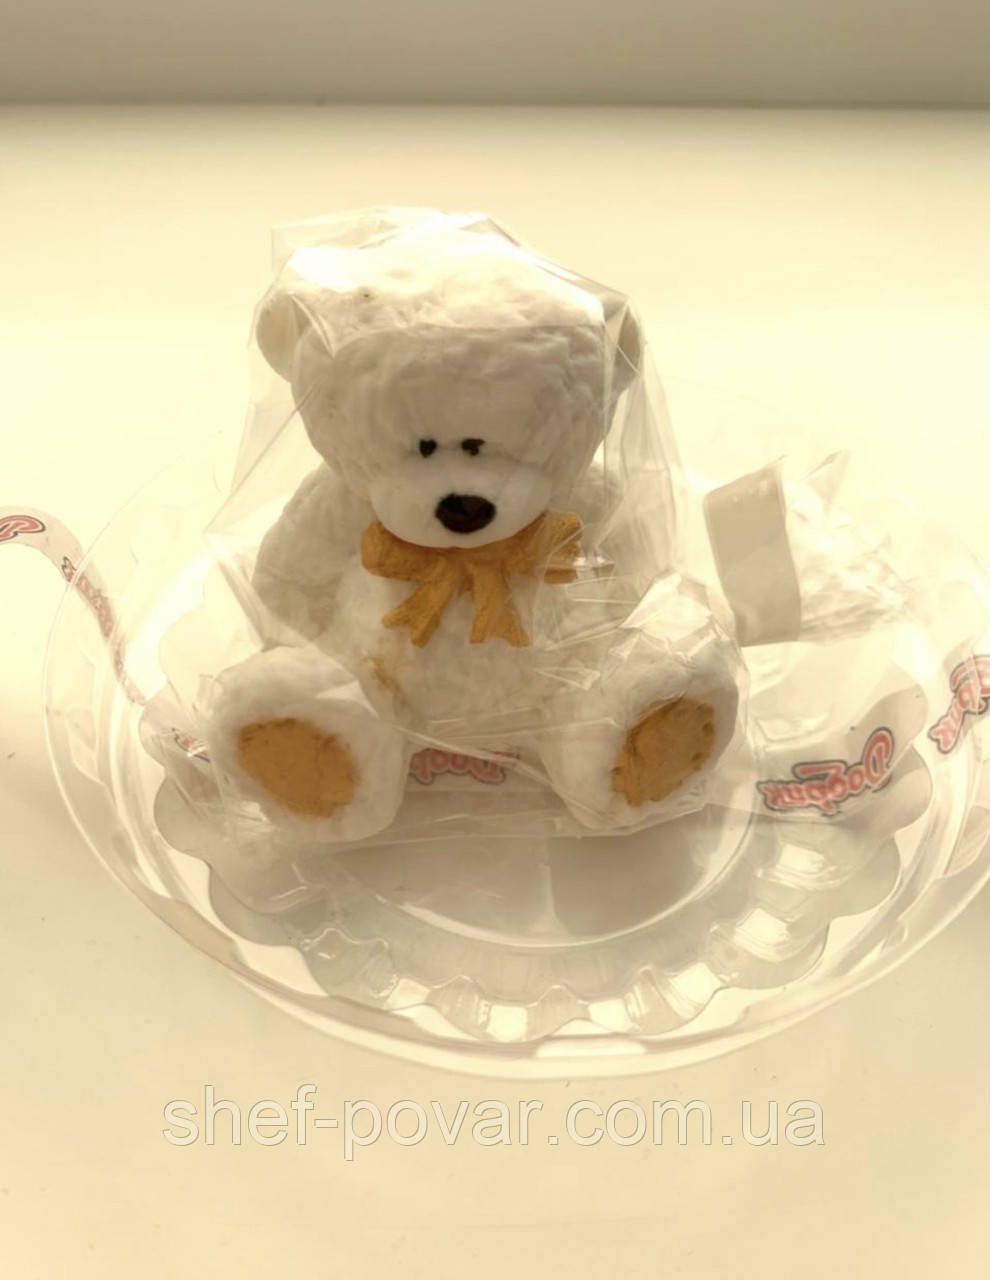 Медвежонок Тедди 3D